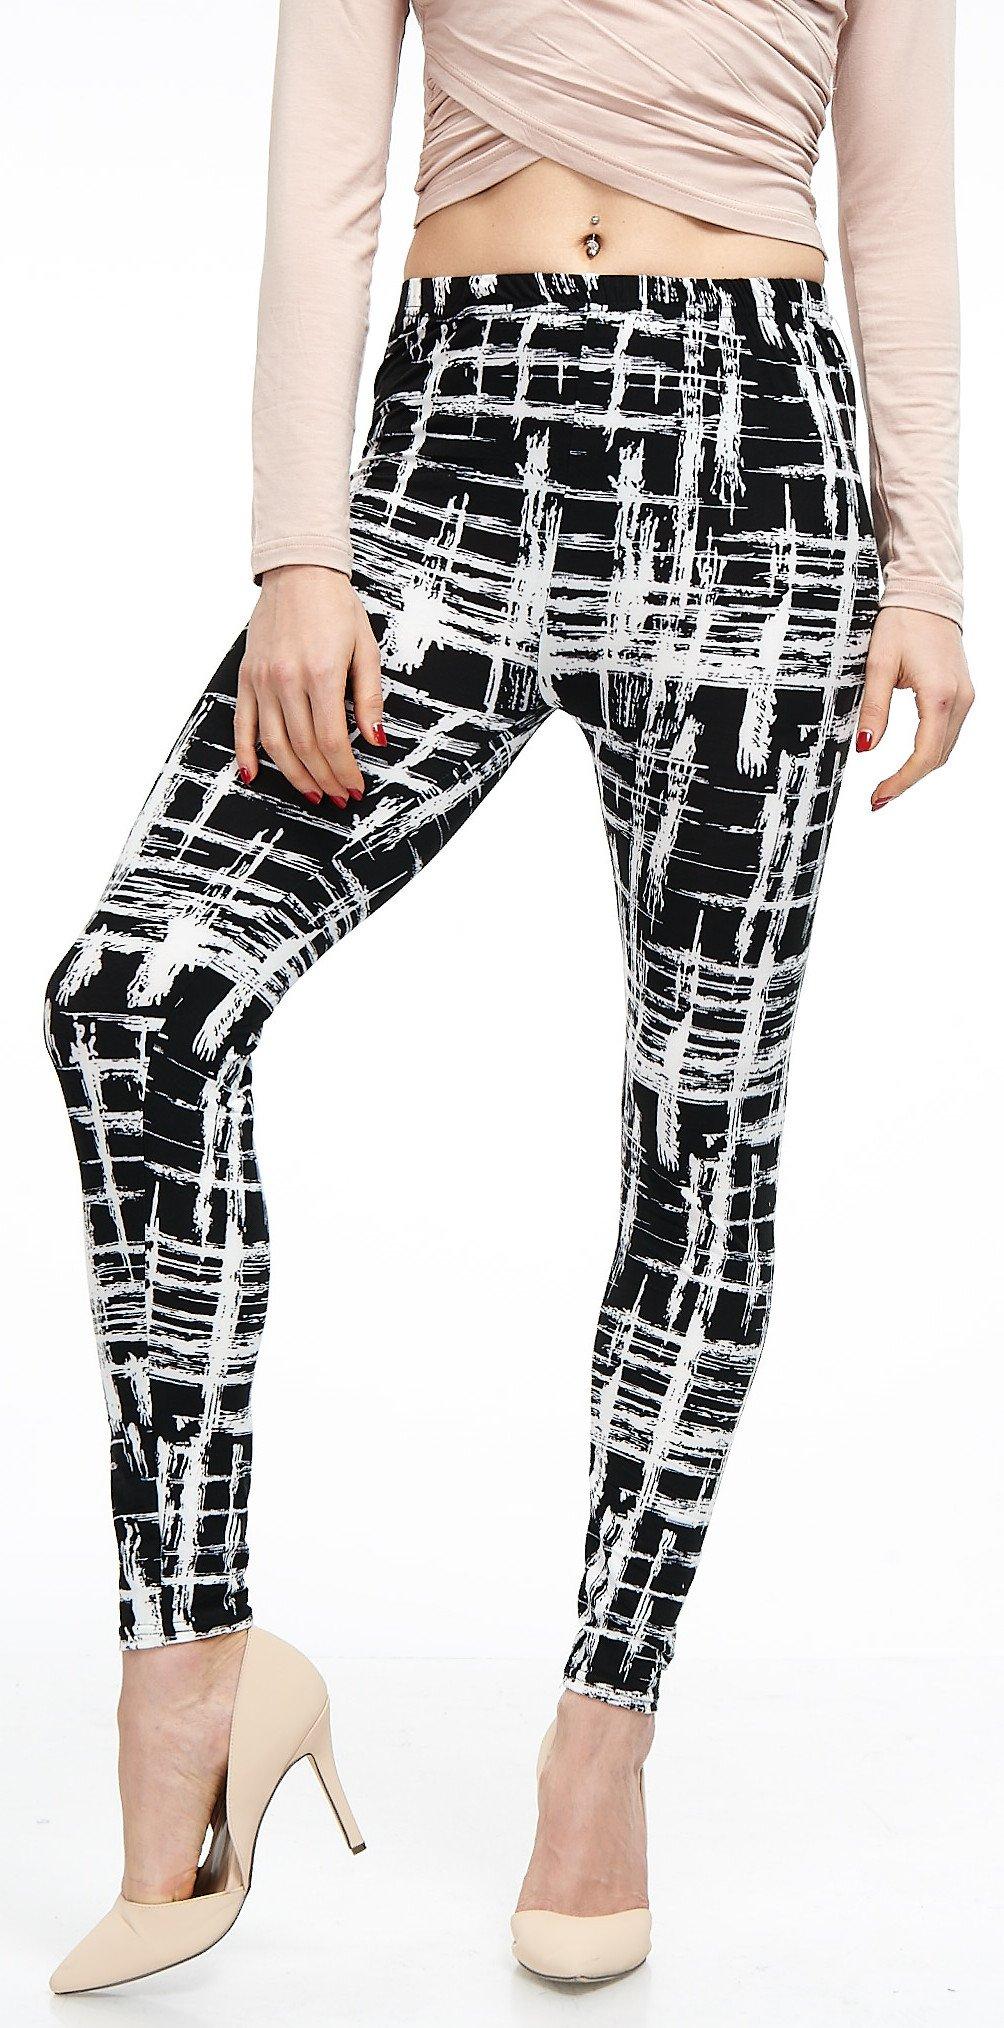 LMB Lush Moda Extra Soft Leggings with Designs- Variety of Prints - 720F Black White Stripes B5 by LMB (Image #3)